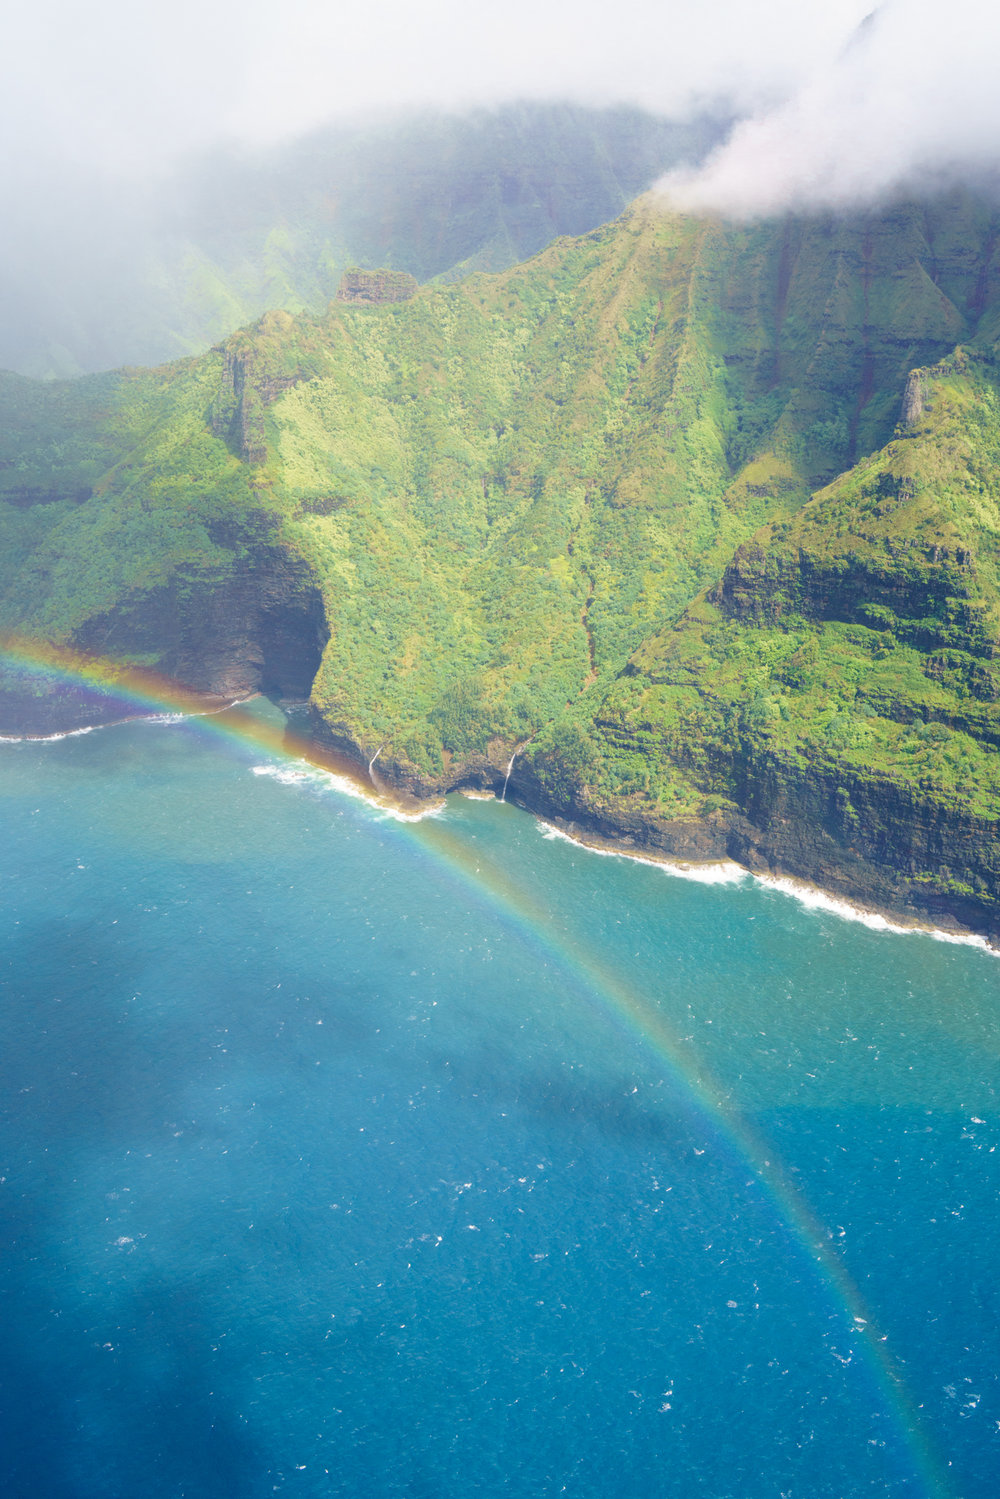 Rainbows and waterfall views along the Na Pali Coast Kauai | Never Settle Travel